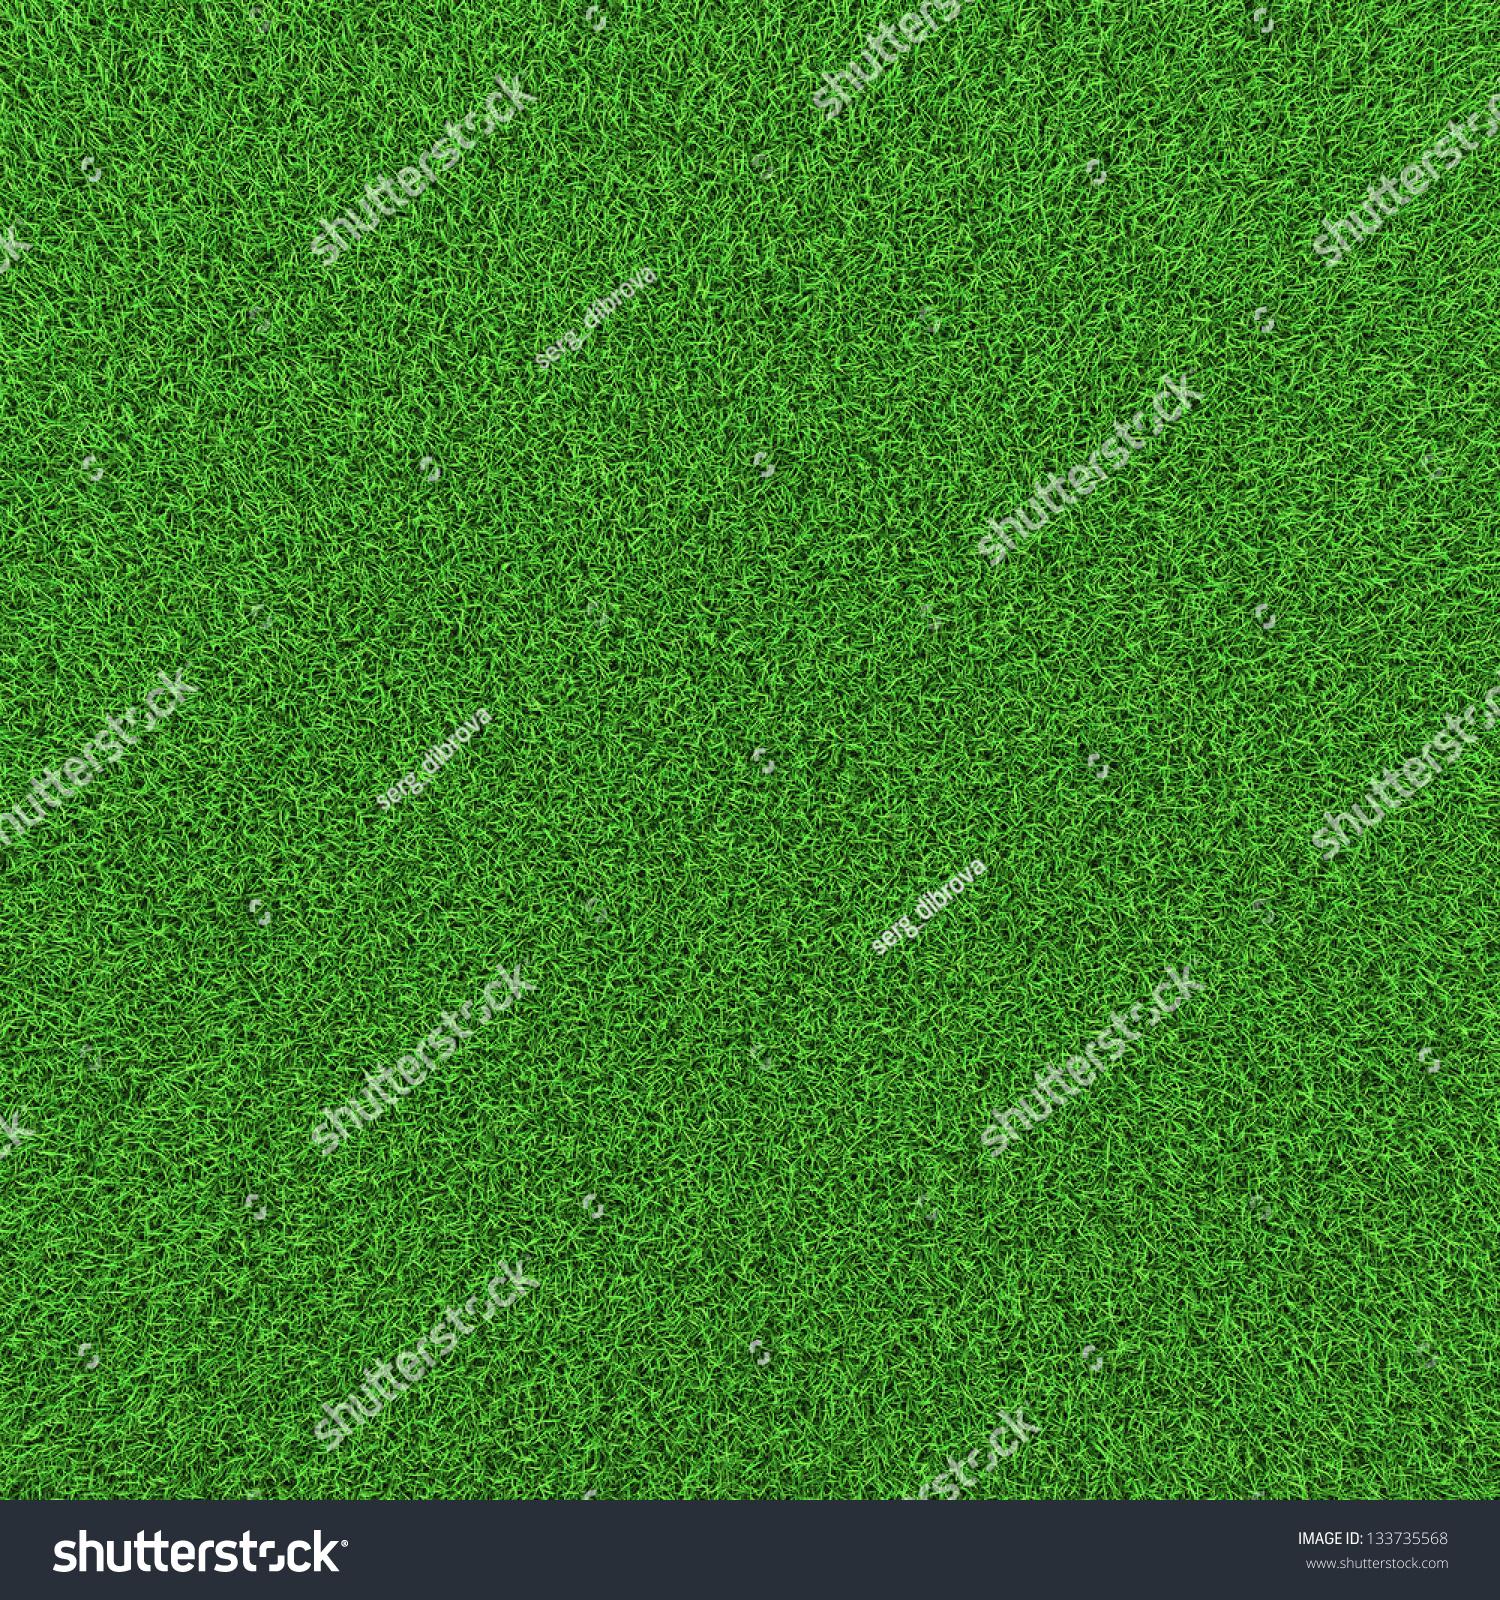 Green Grass Background Texture High Resolution Stock Illustration ...